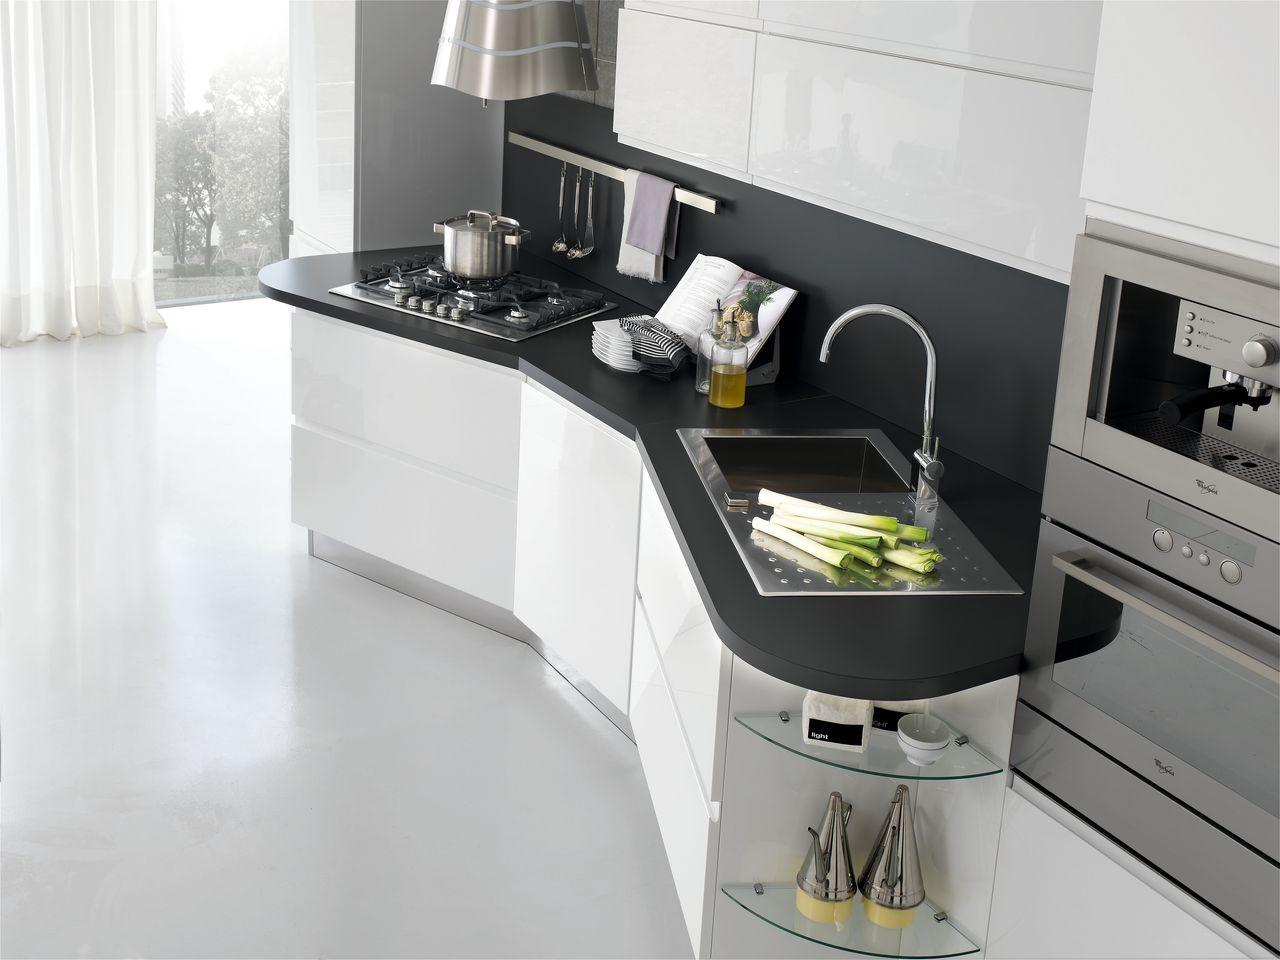 Cucina Bring Stosa - Orecchioni Mobili